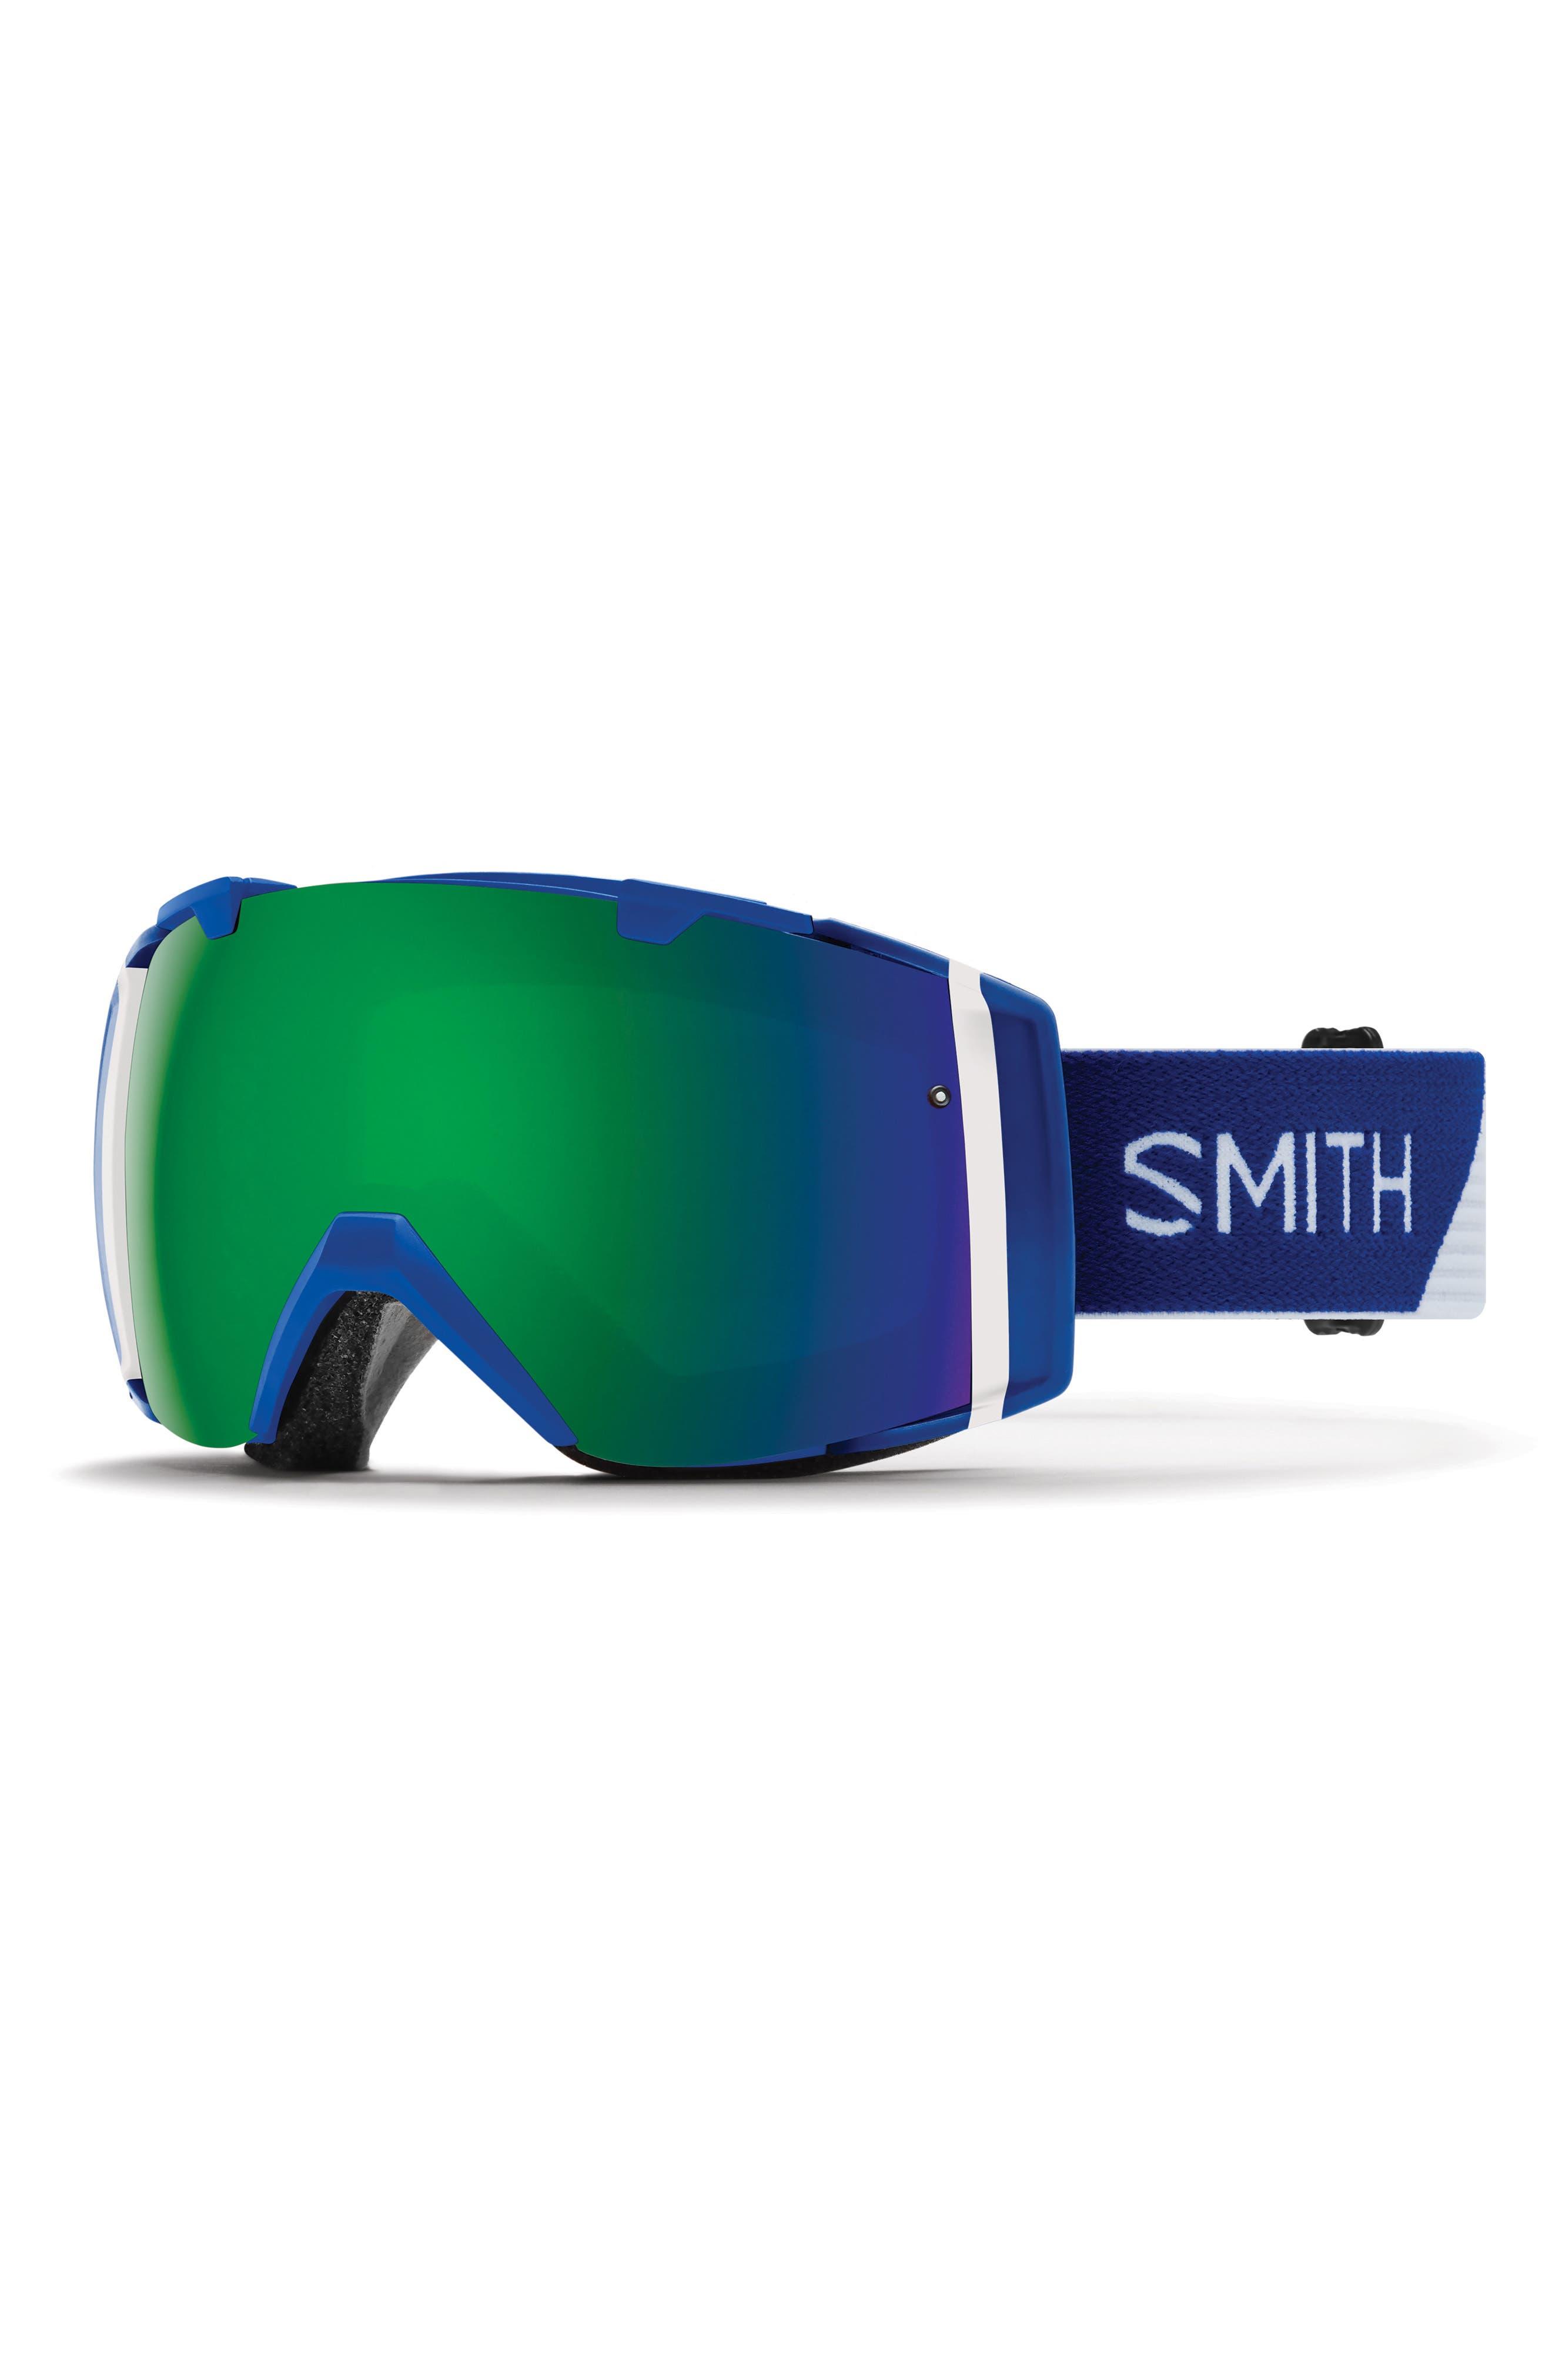 Alternate Image 1 Selected - Smith I/OX 205mm Chromapop Snow Goggles